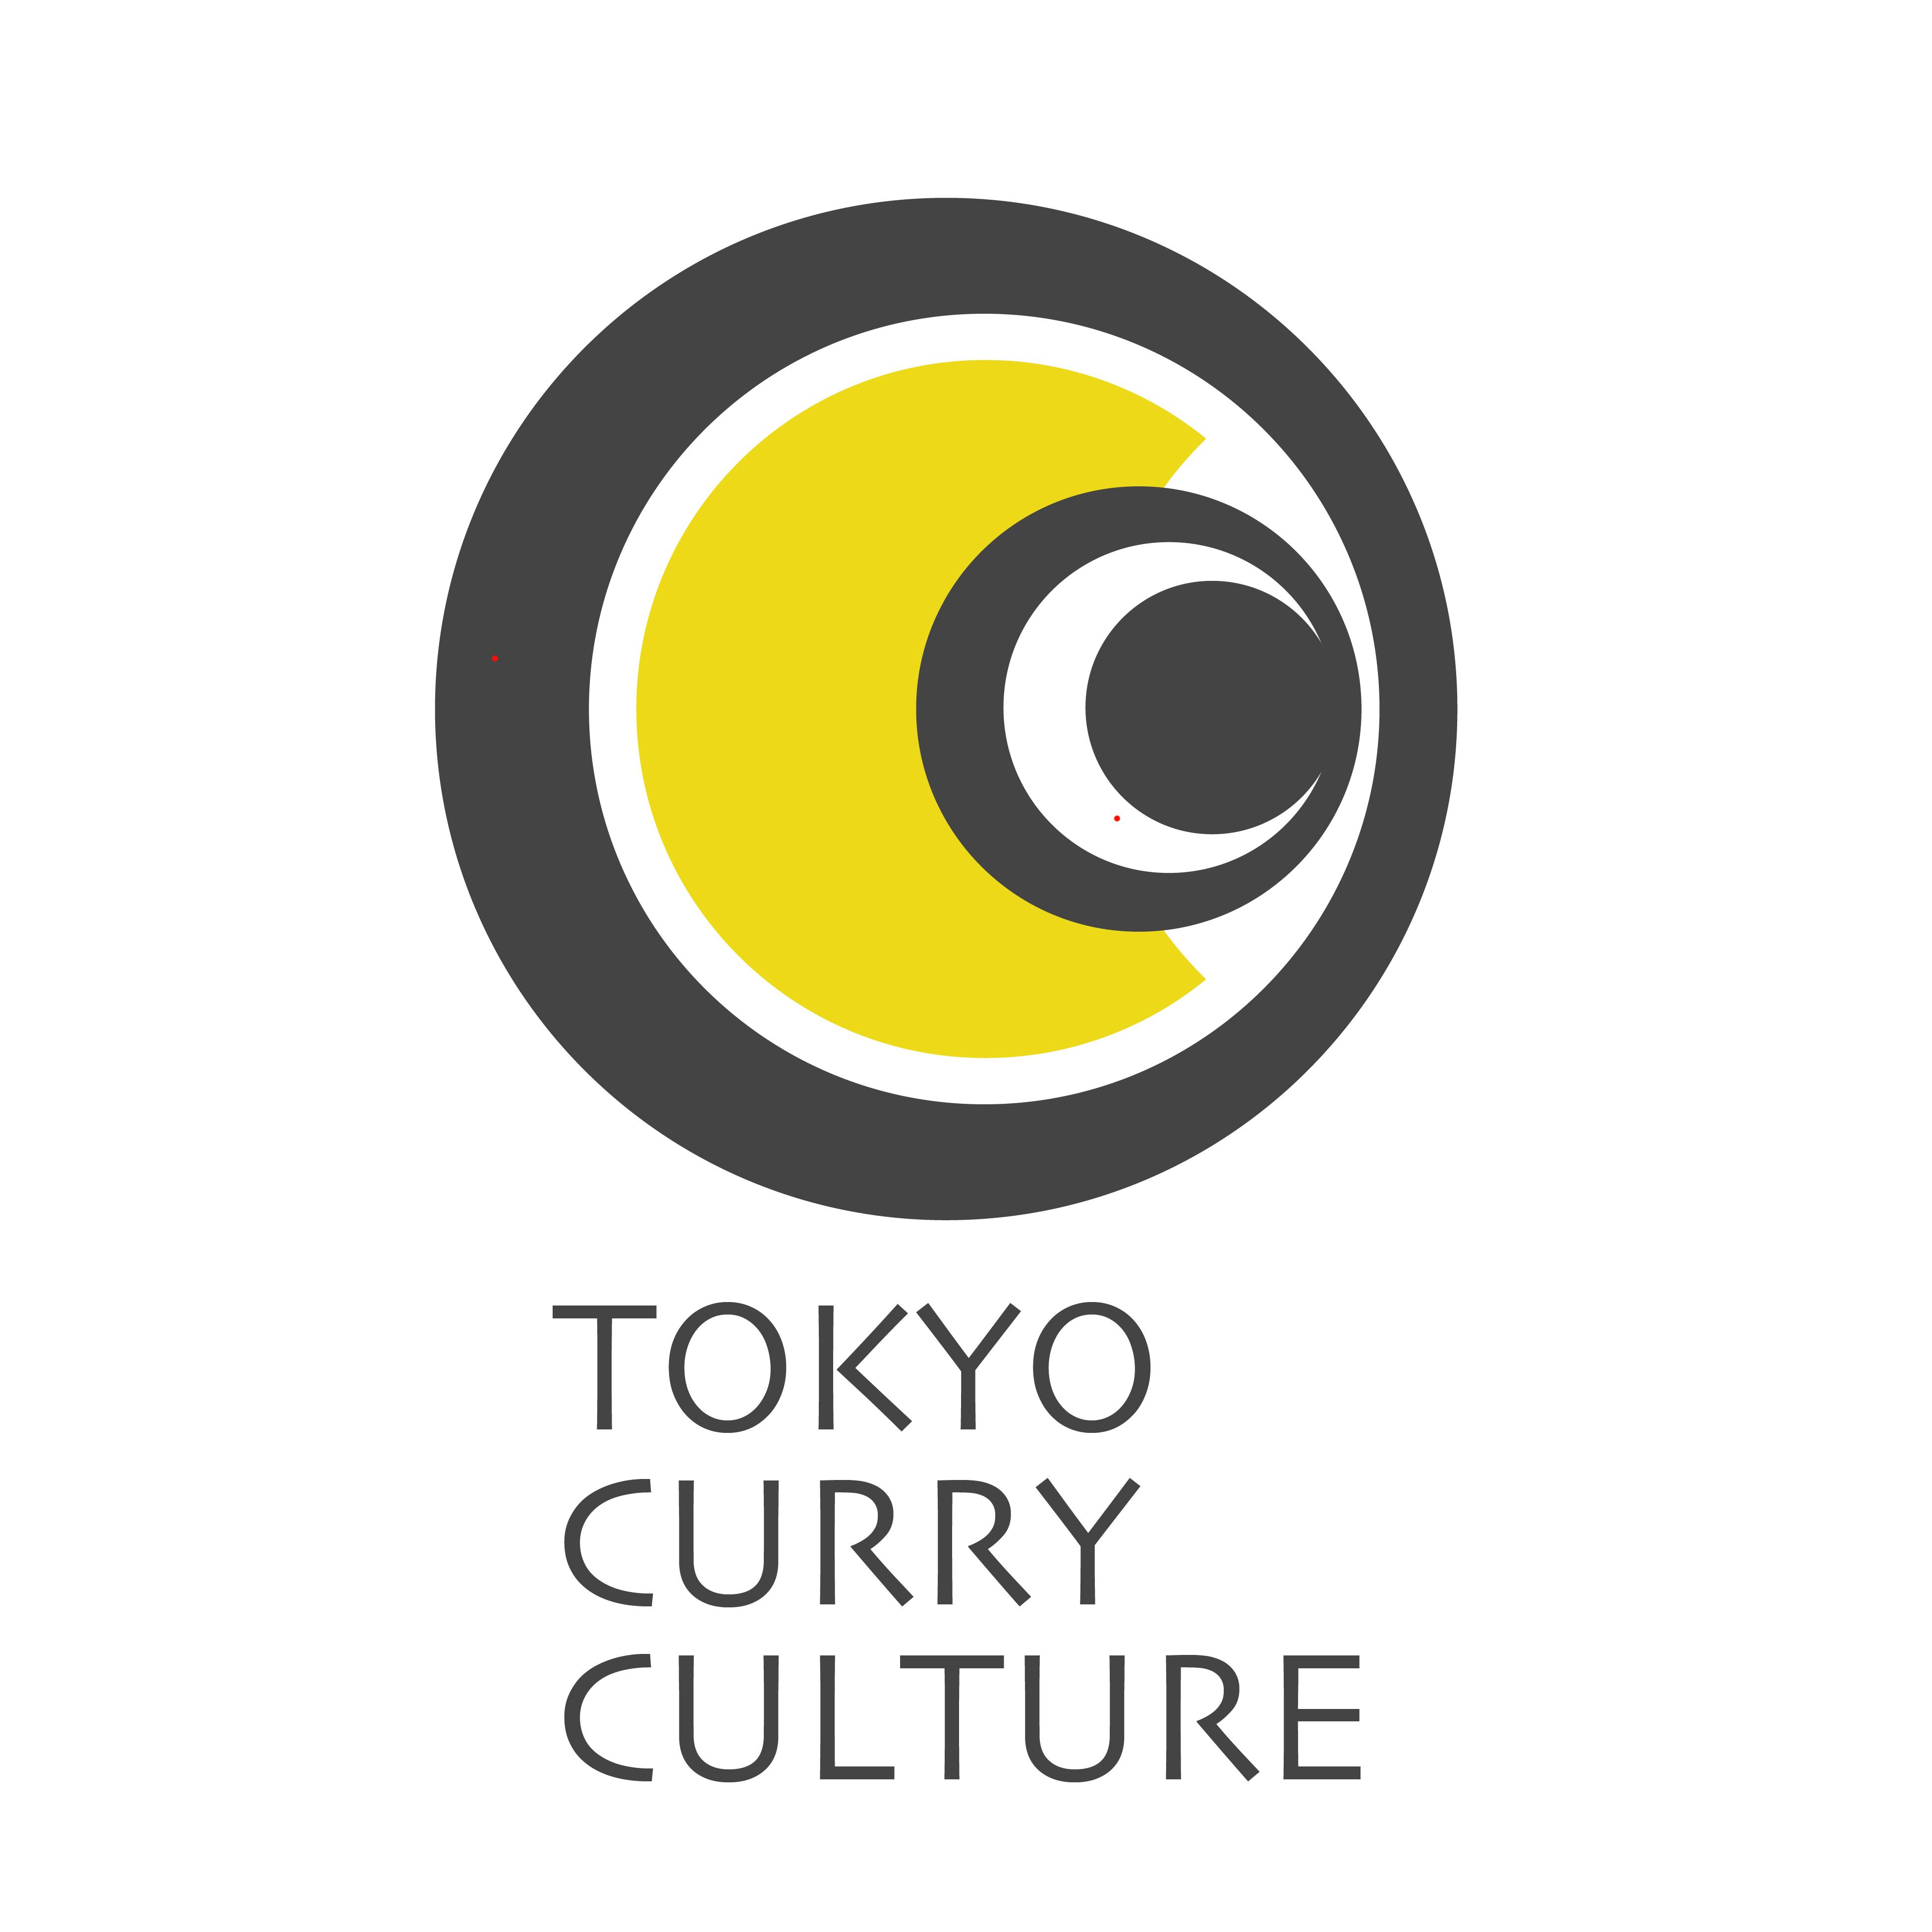 TOKYOCC_logo_square_small.jpg